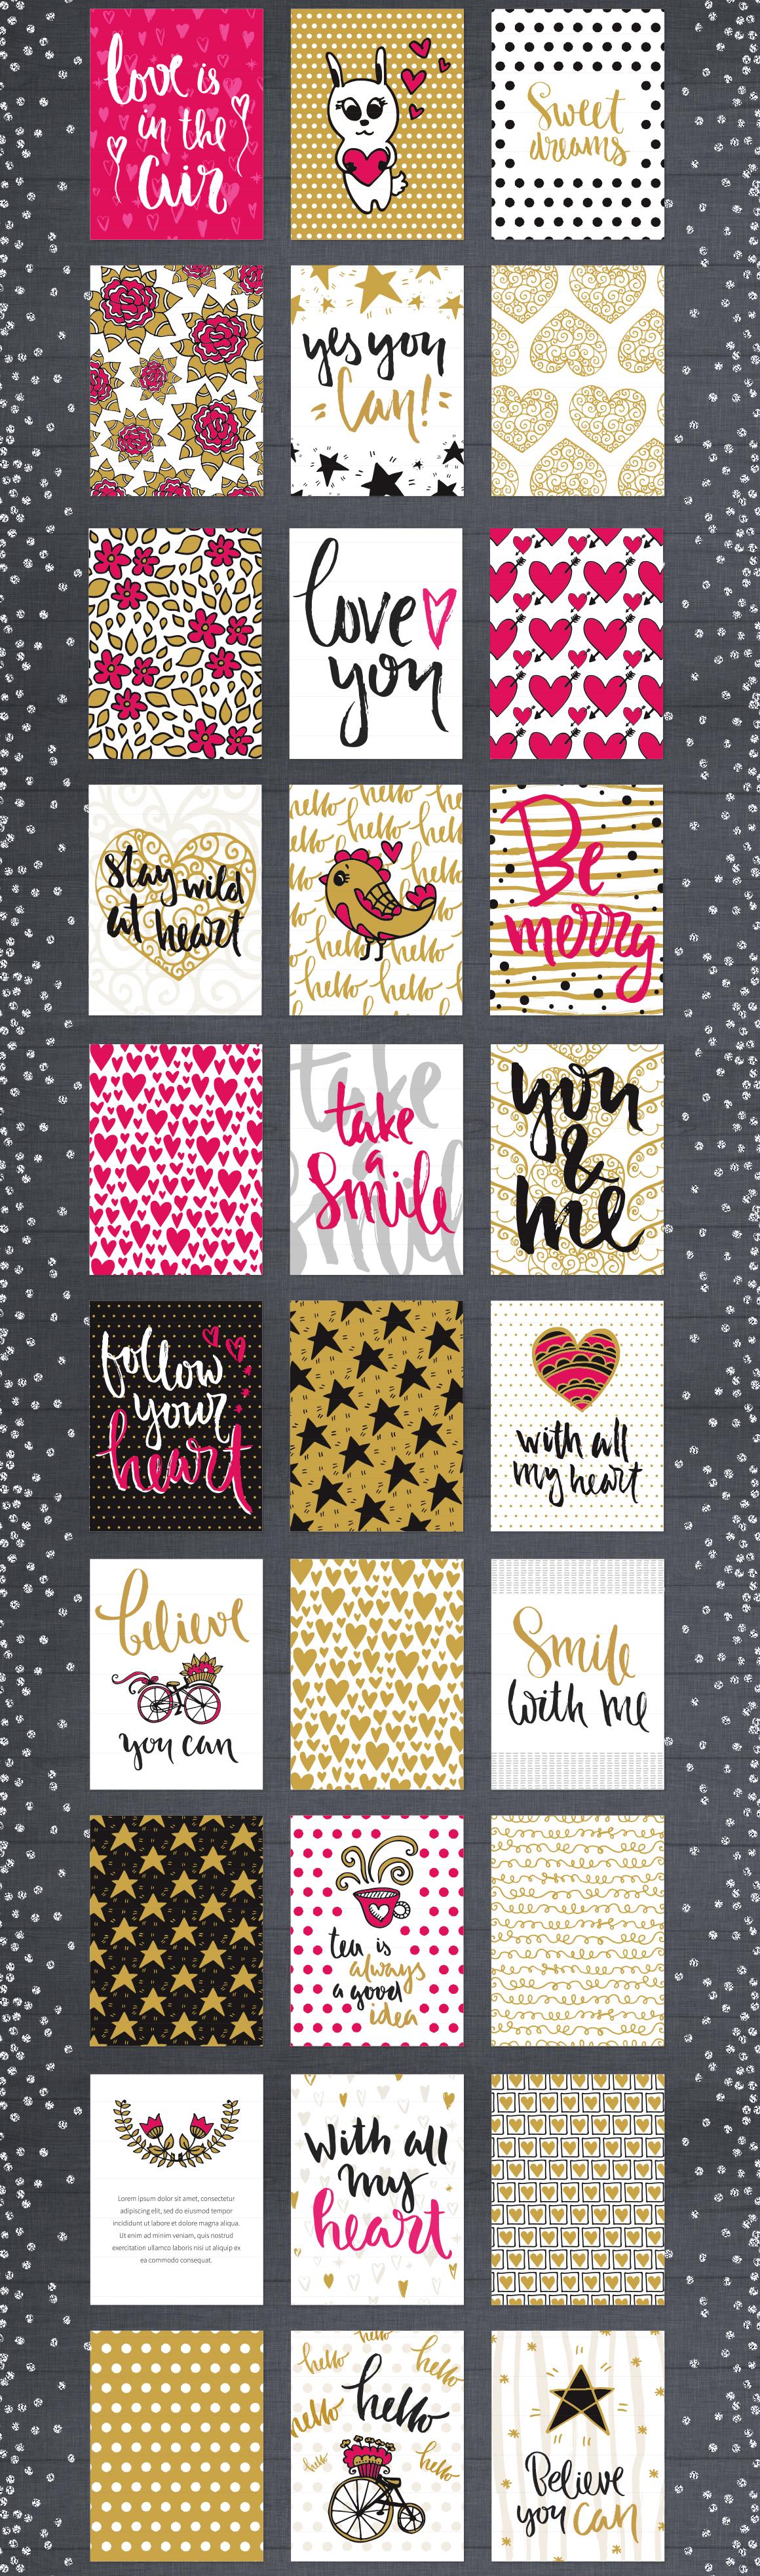 60 Valentine's Day Romantic Cards #4 example image 3